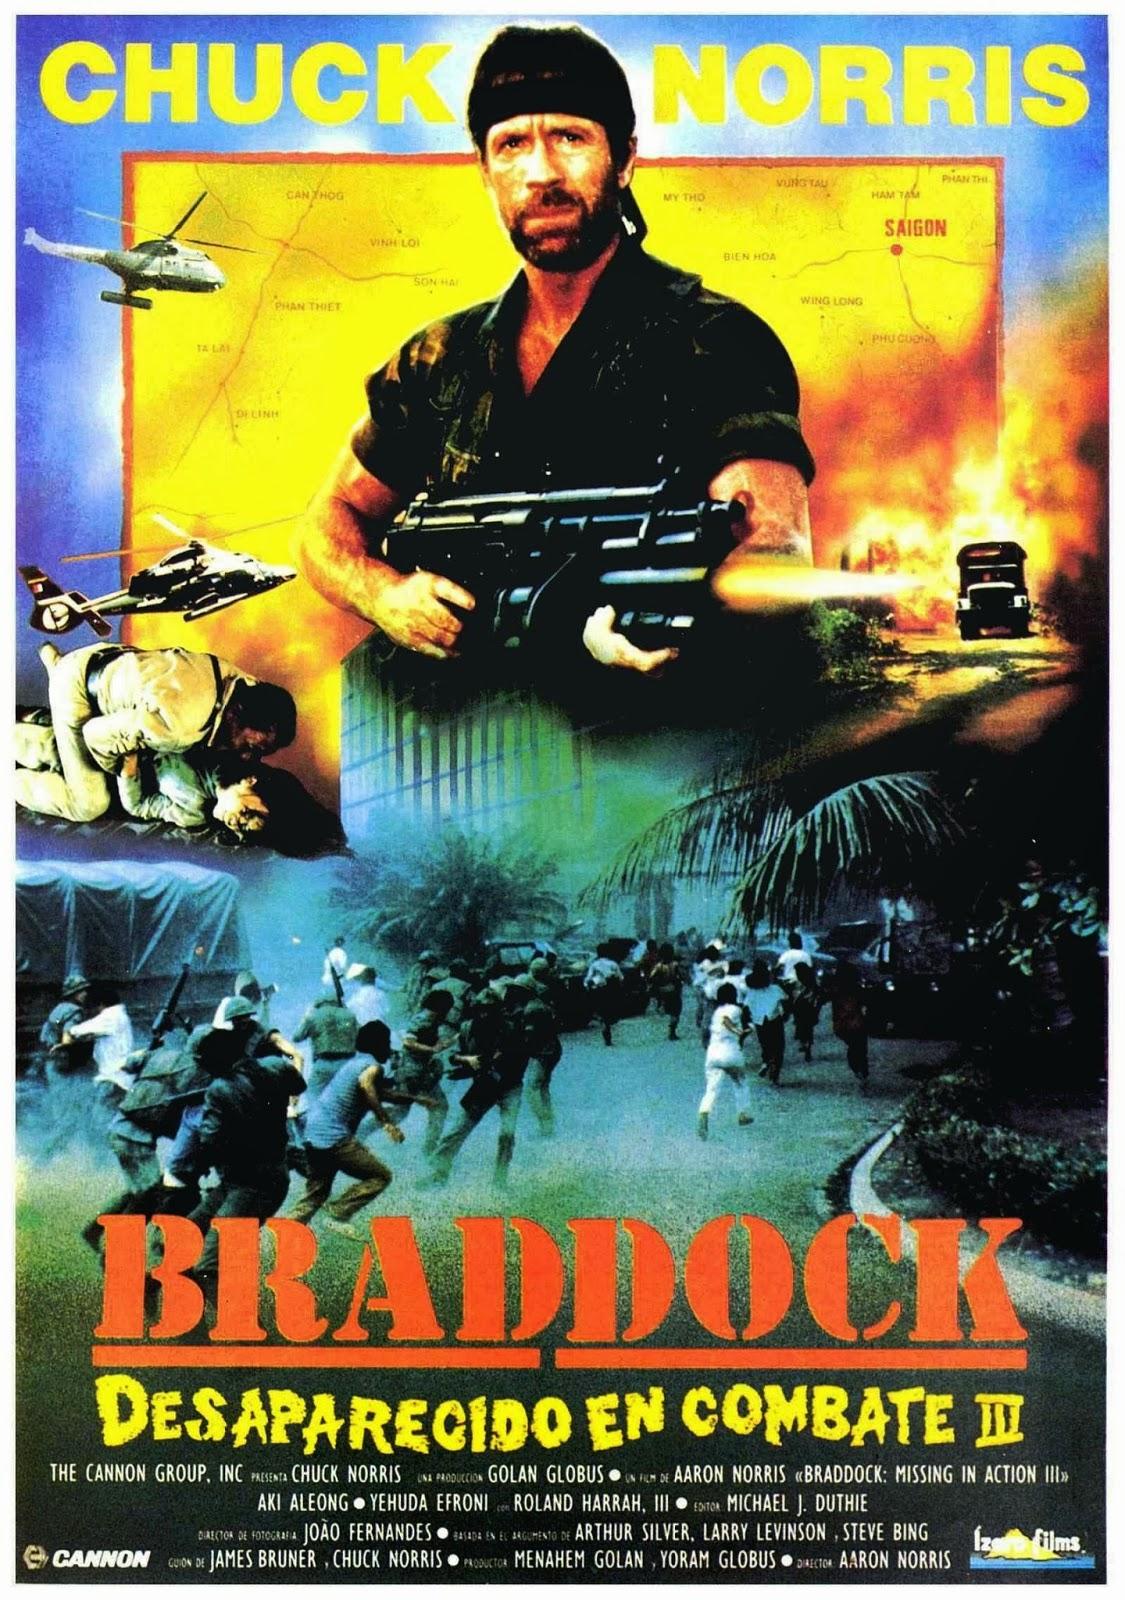 Braddock missing in action iii online dating